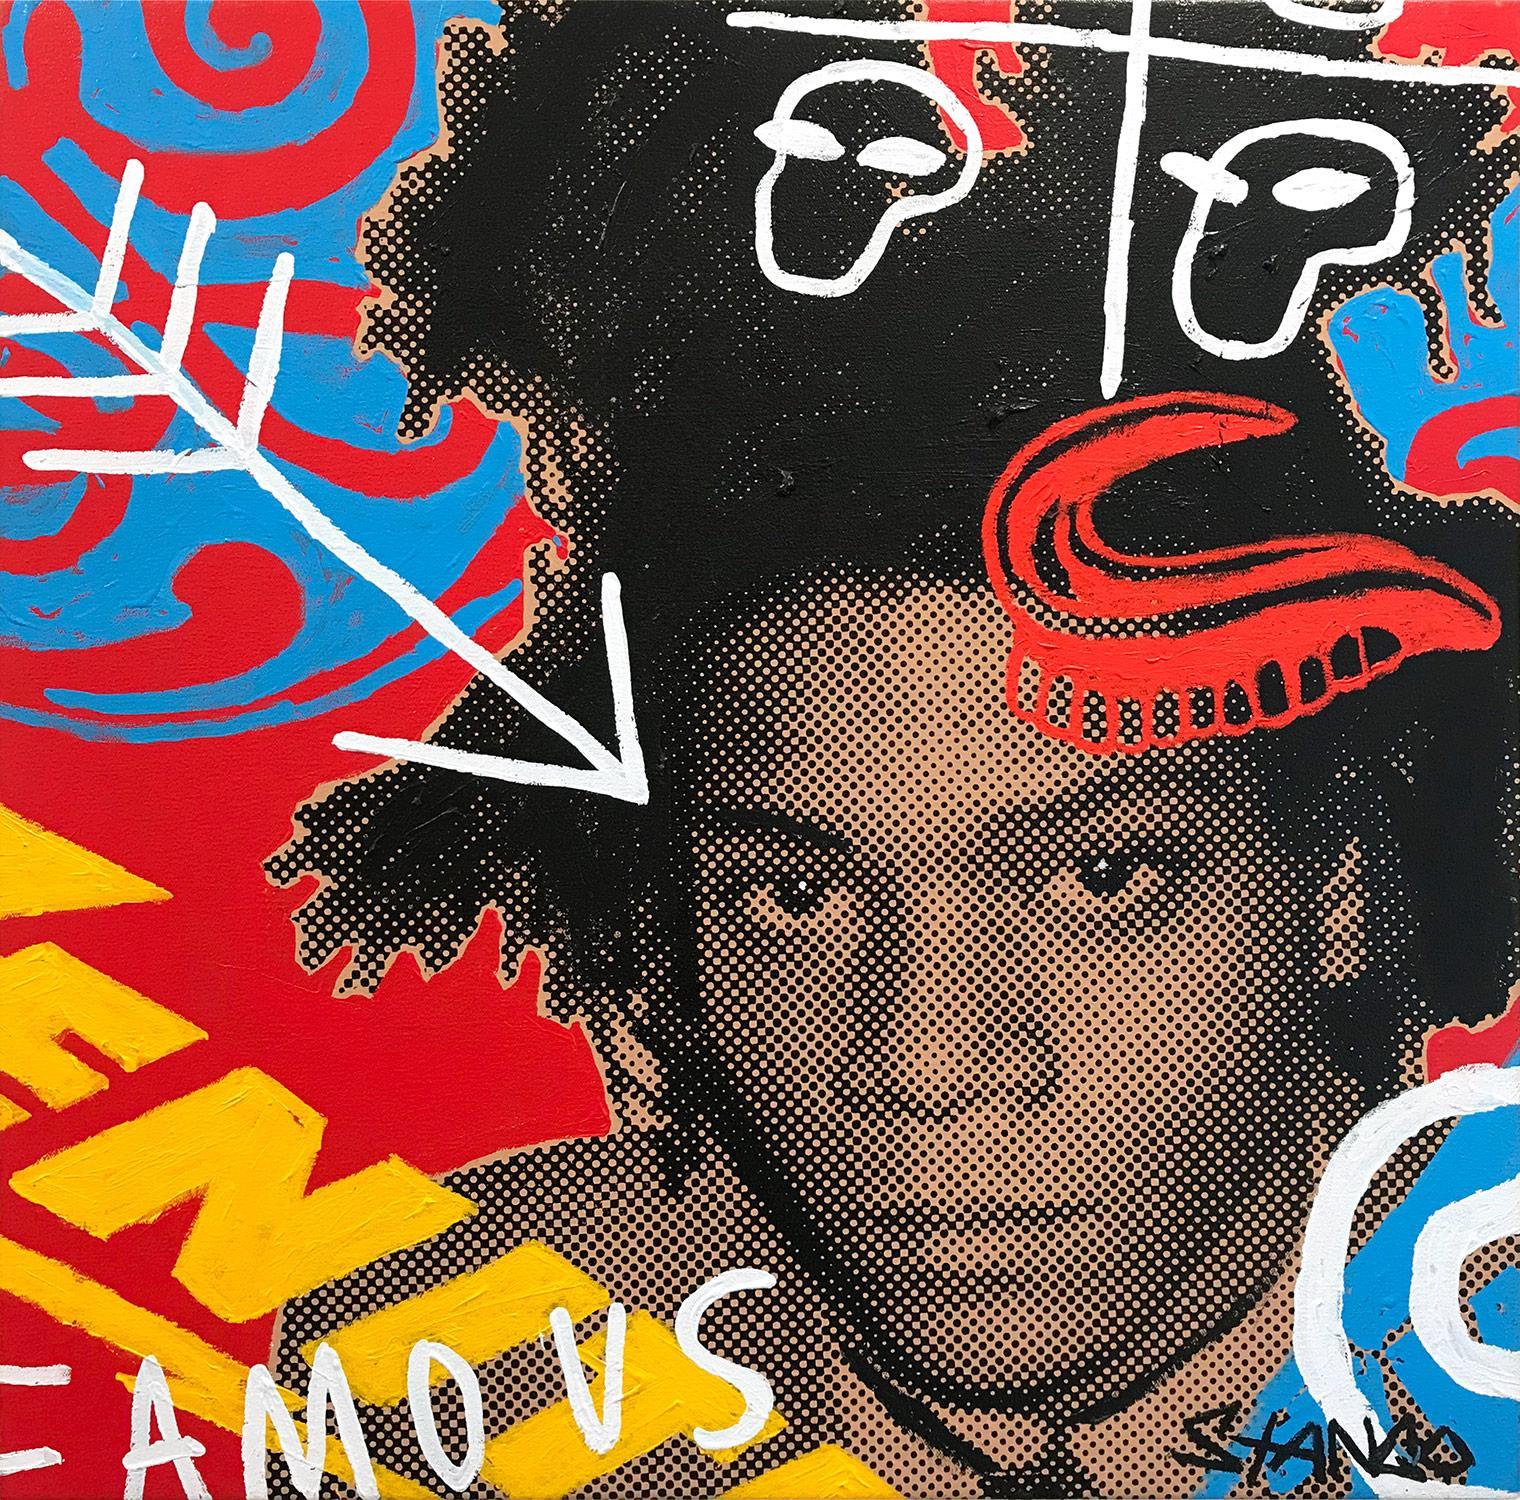 Basquiat/Samo